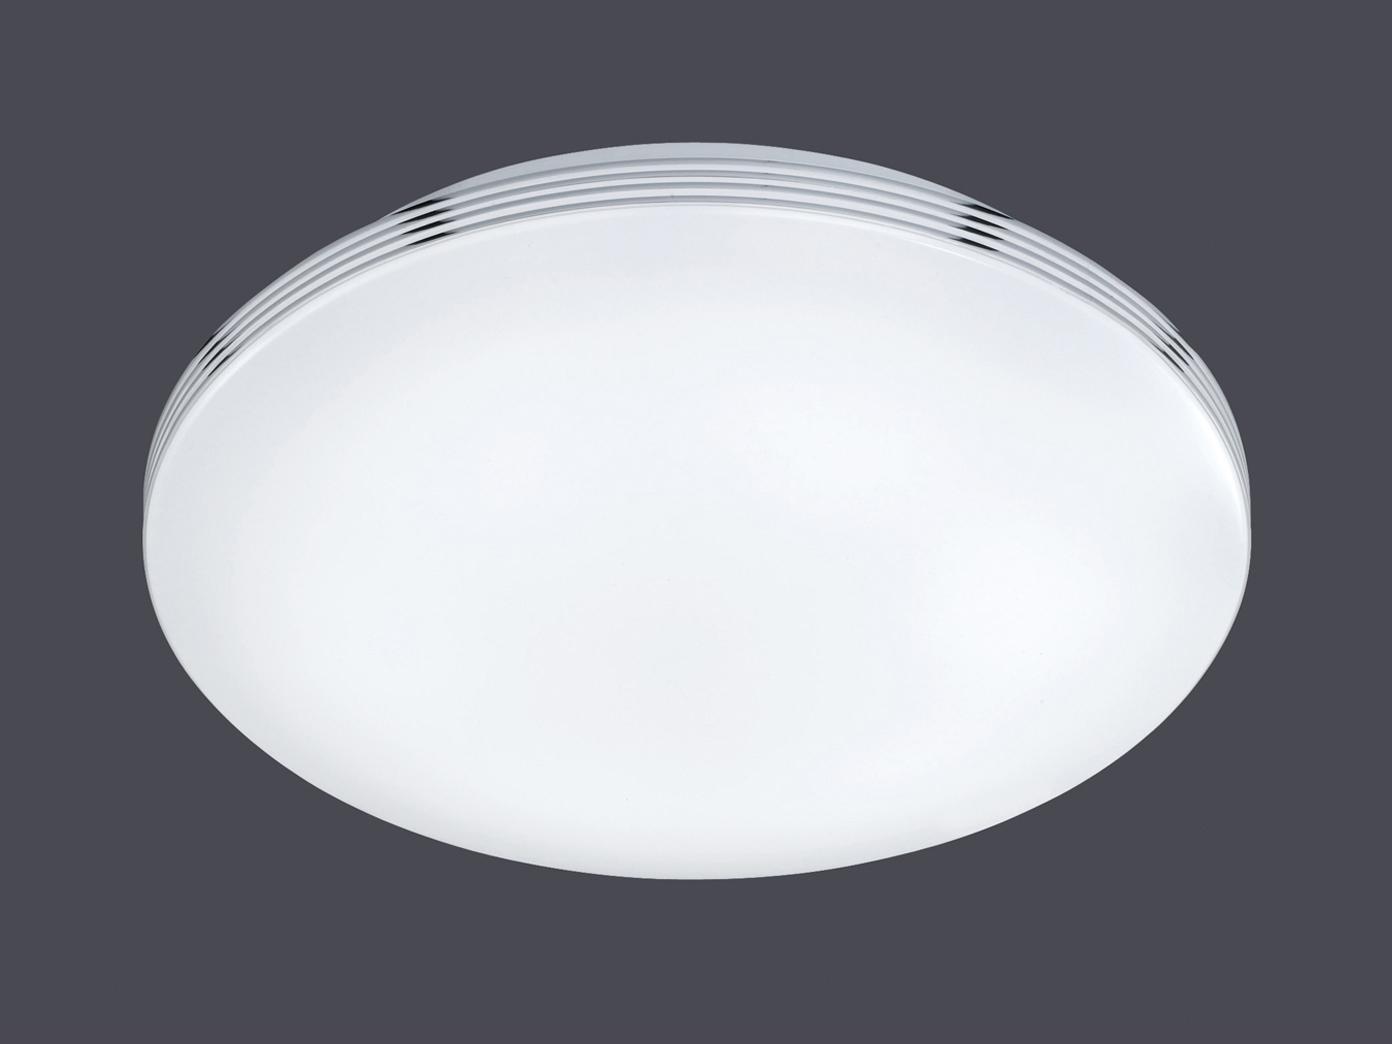 Led Deckenleuchte Badezimmerlampe Apart Chrom Acryl Weiss O 41 Cm